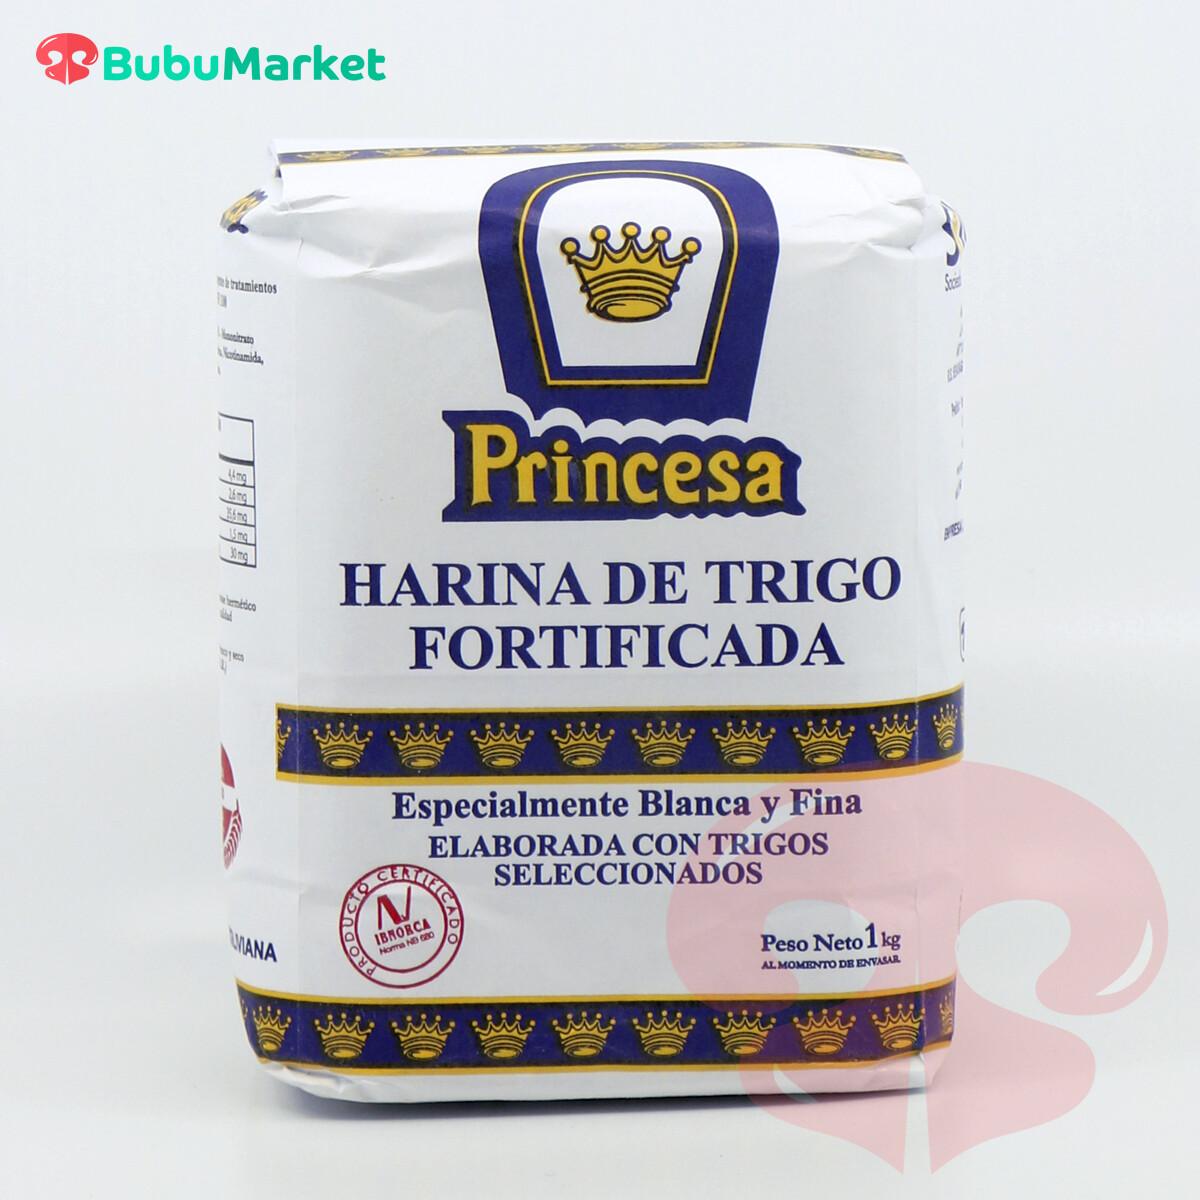 HARINA DE TRIGO FORTIFICADA PRINCESA DE 1 KG.